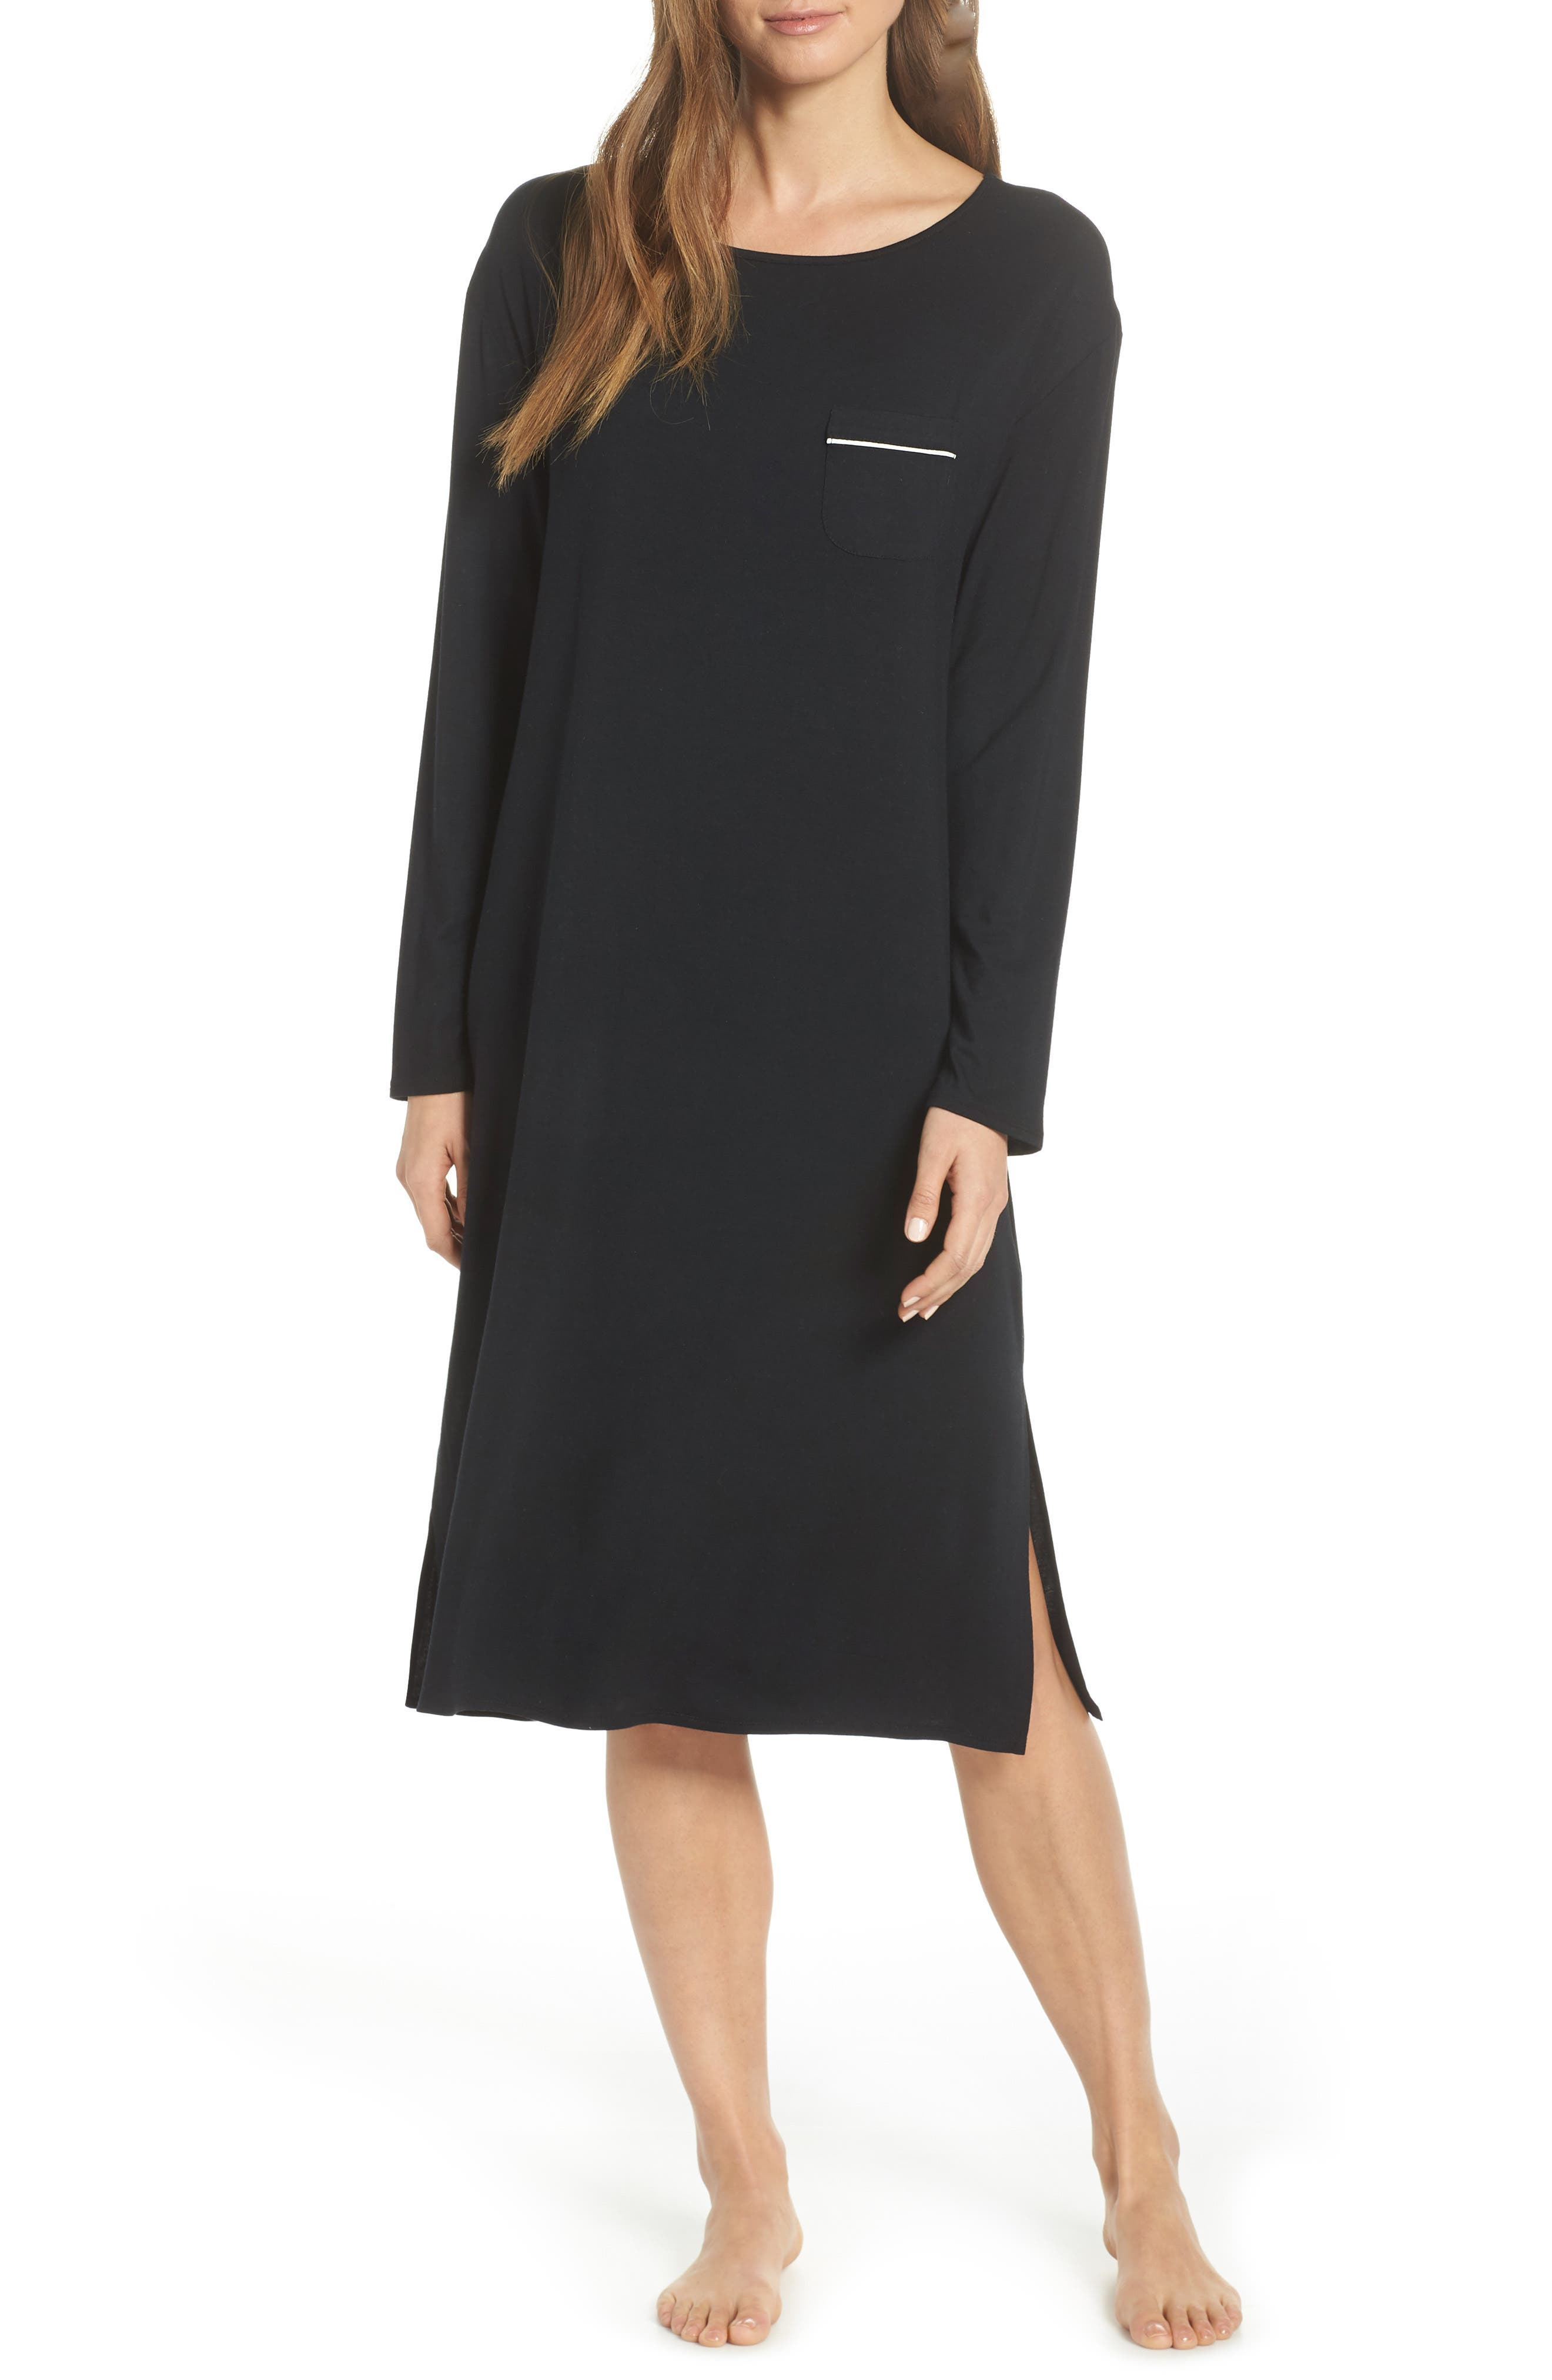 Nordstrom Lingerie Moonlight Midi Nightgown, Black